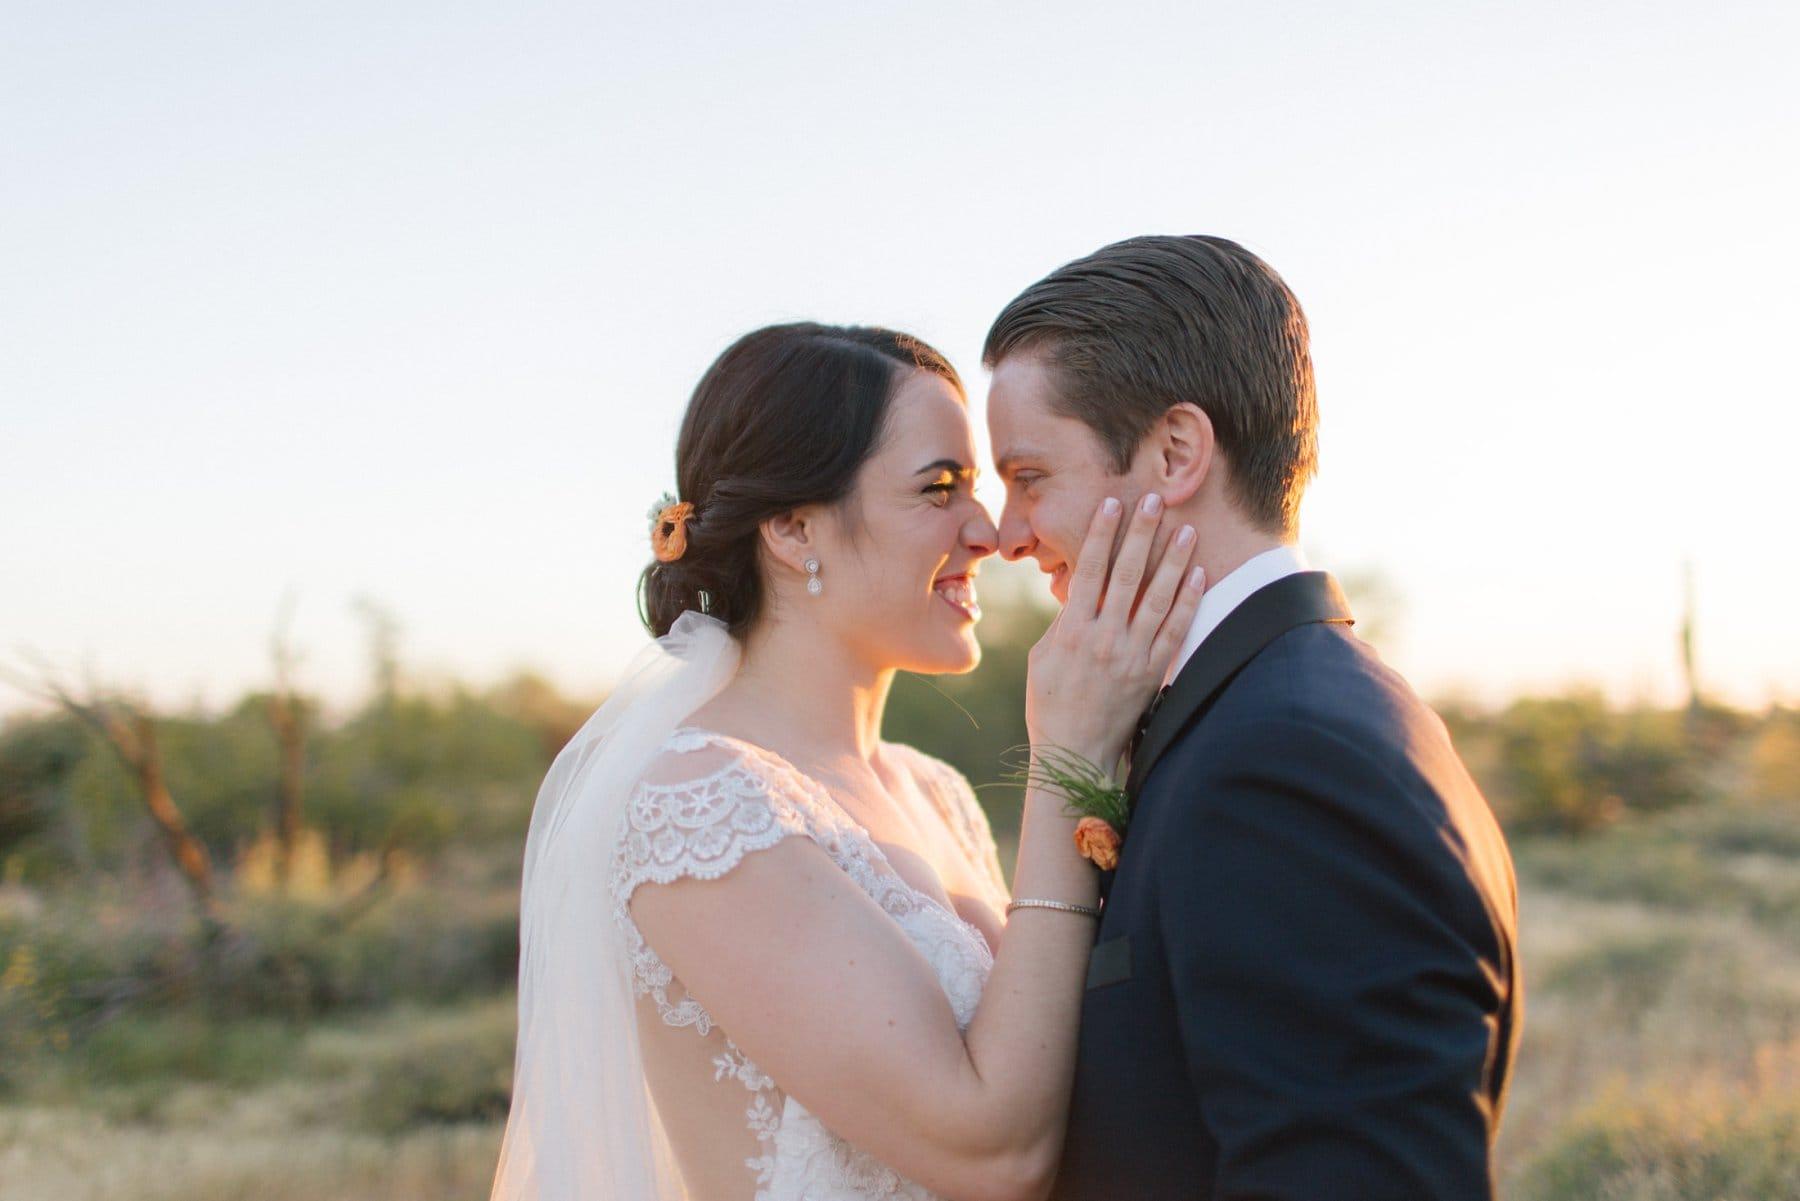 real genuine bride & groom photos in Arizona desert sunset